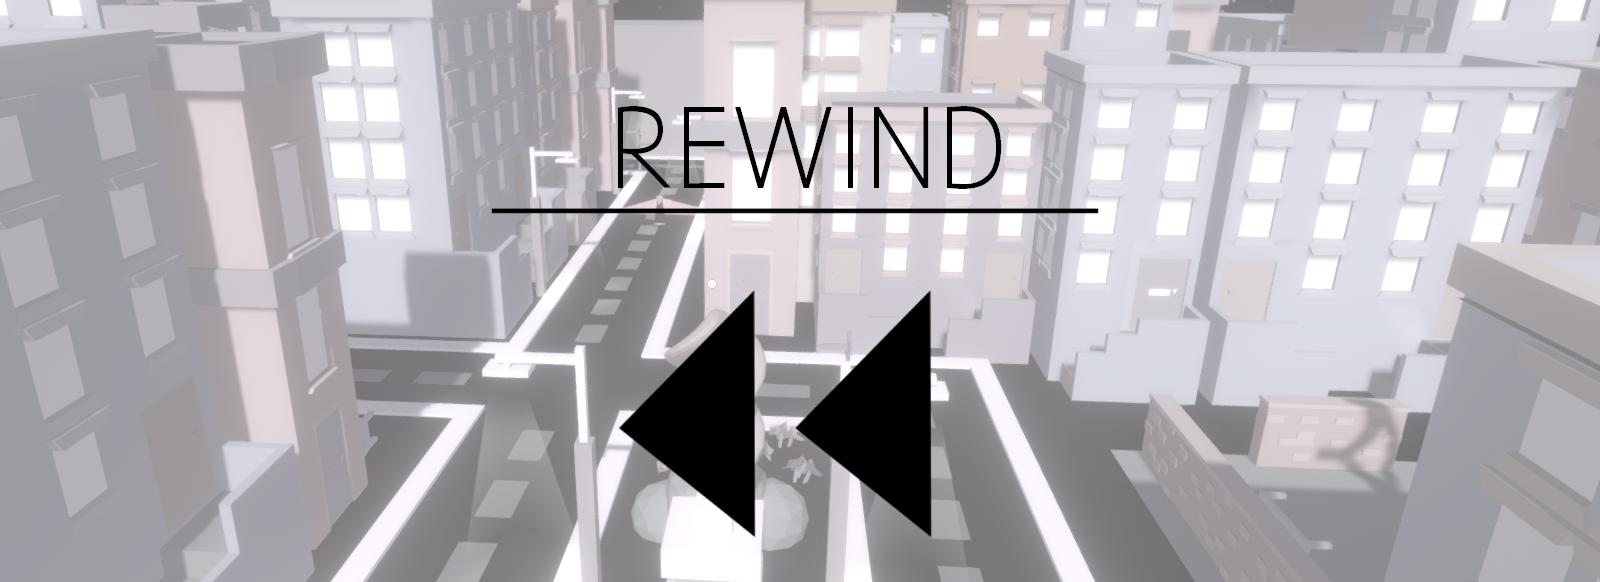 Rewind - Brackeys Game Jam 2020